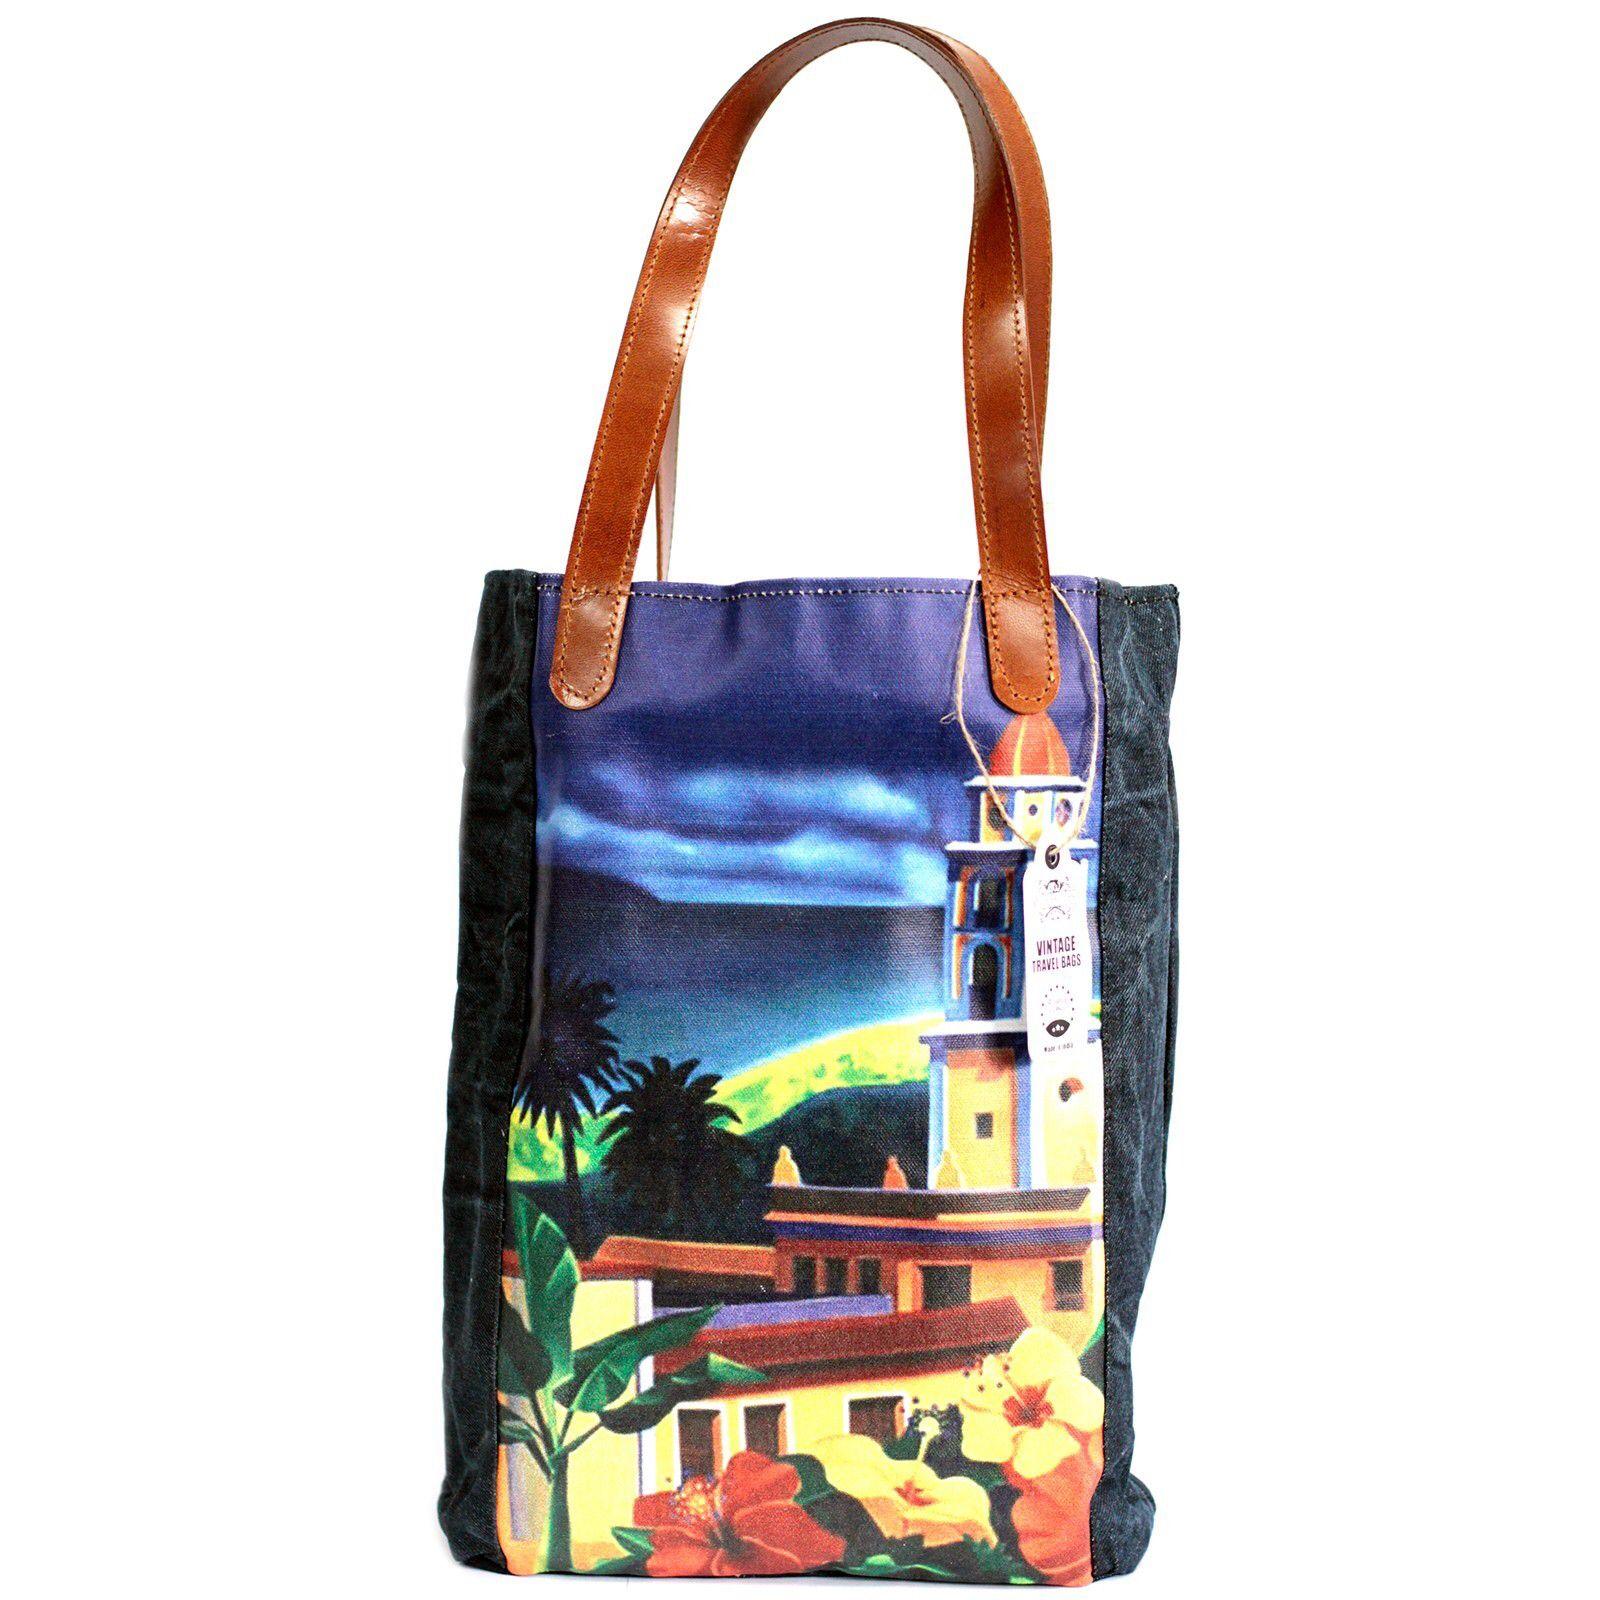 1582b7534d9b Details about Vintage Style Travel Bag - Tote Shoulder Shopping ...